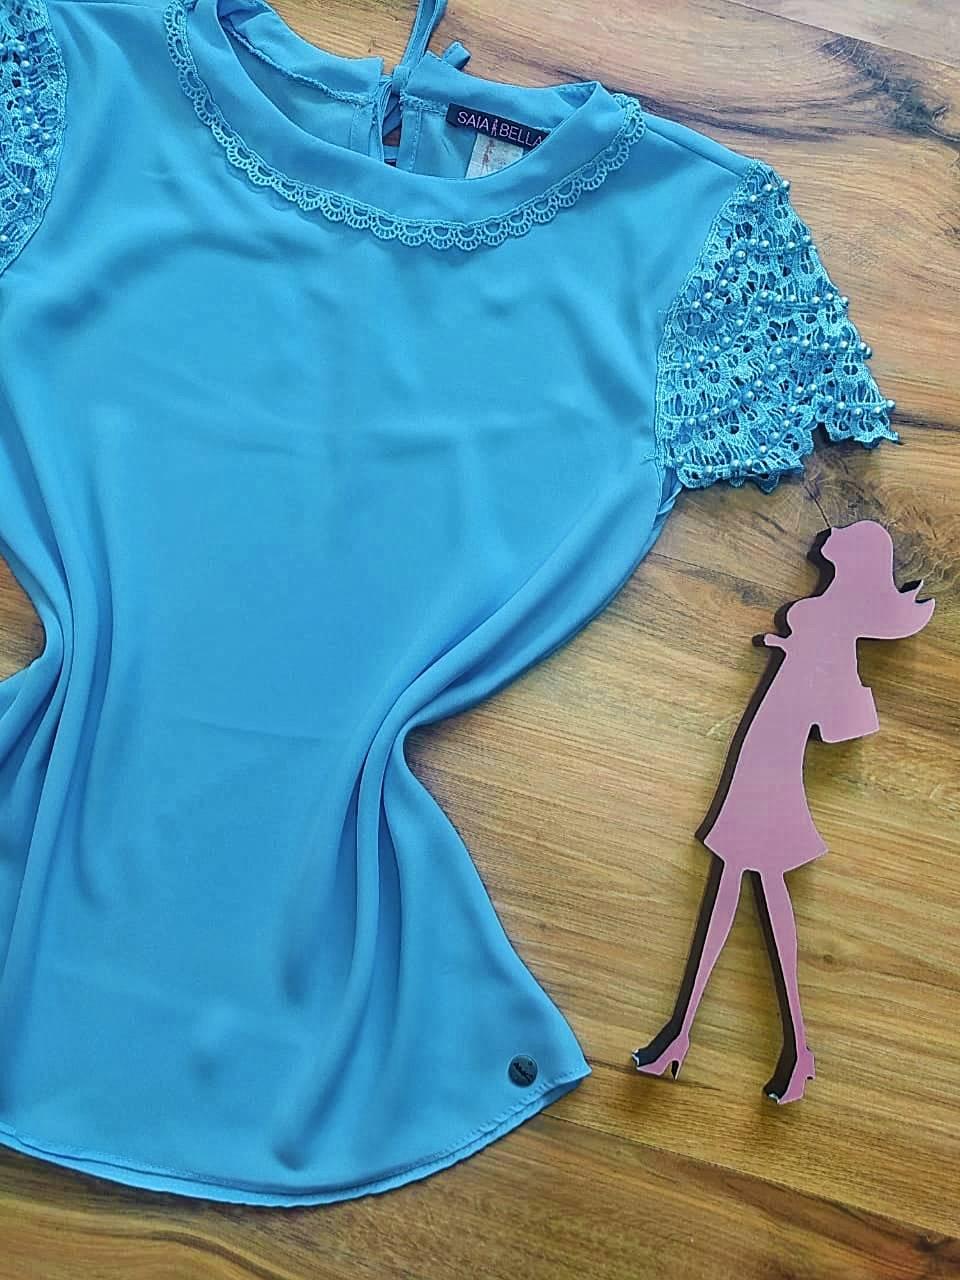 Blusa Clarisse de Renda Saia Bella - SB840701 - Azul Bebê